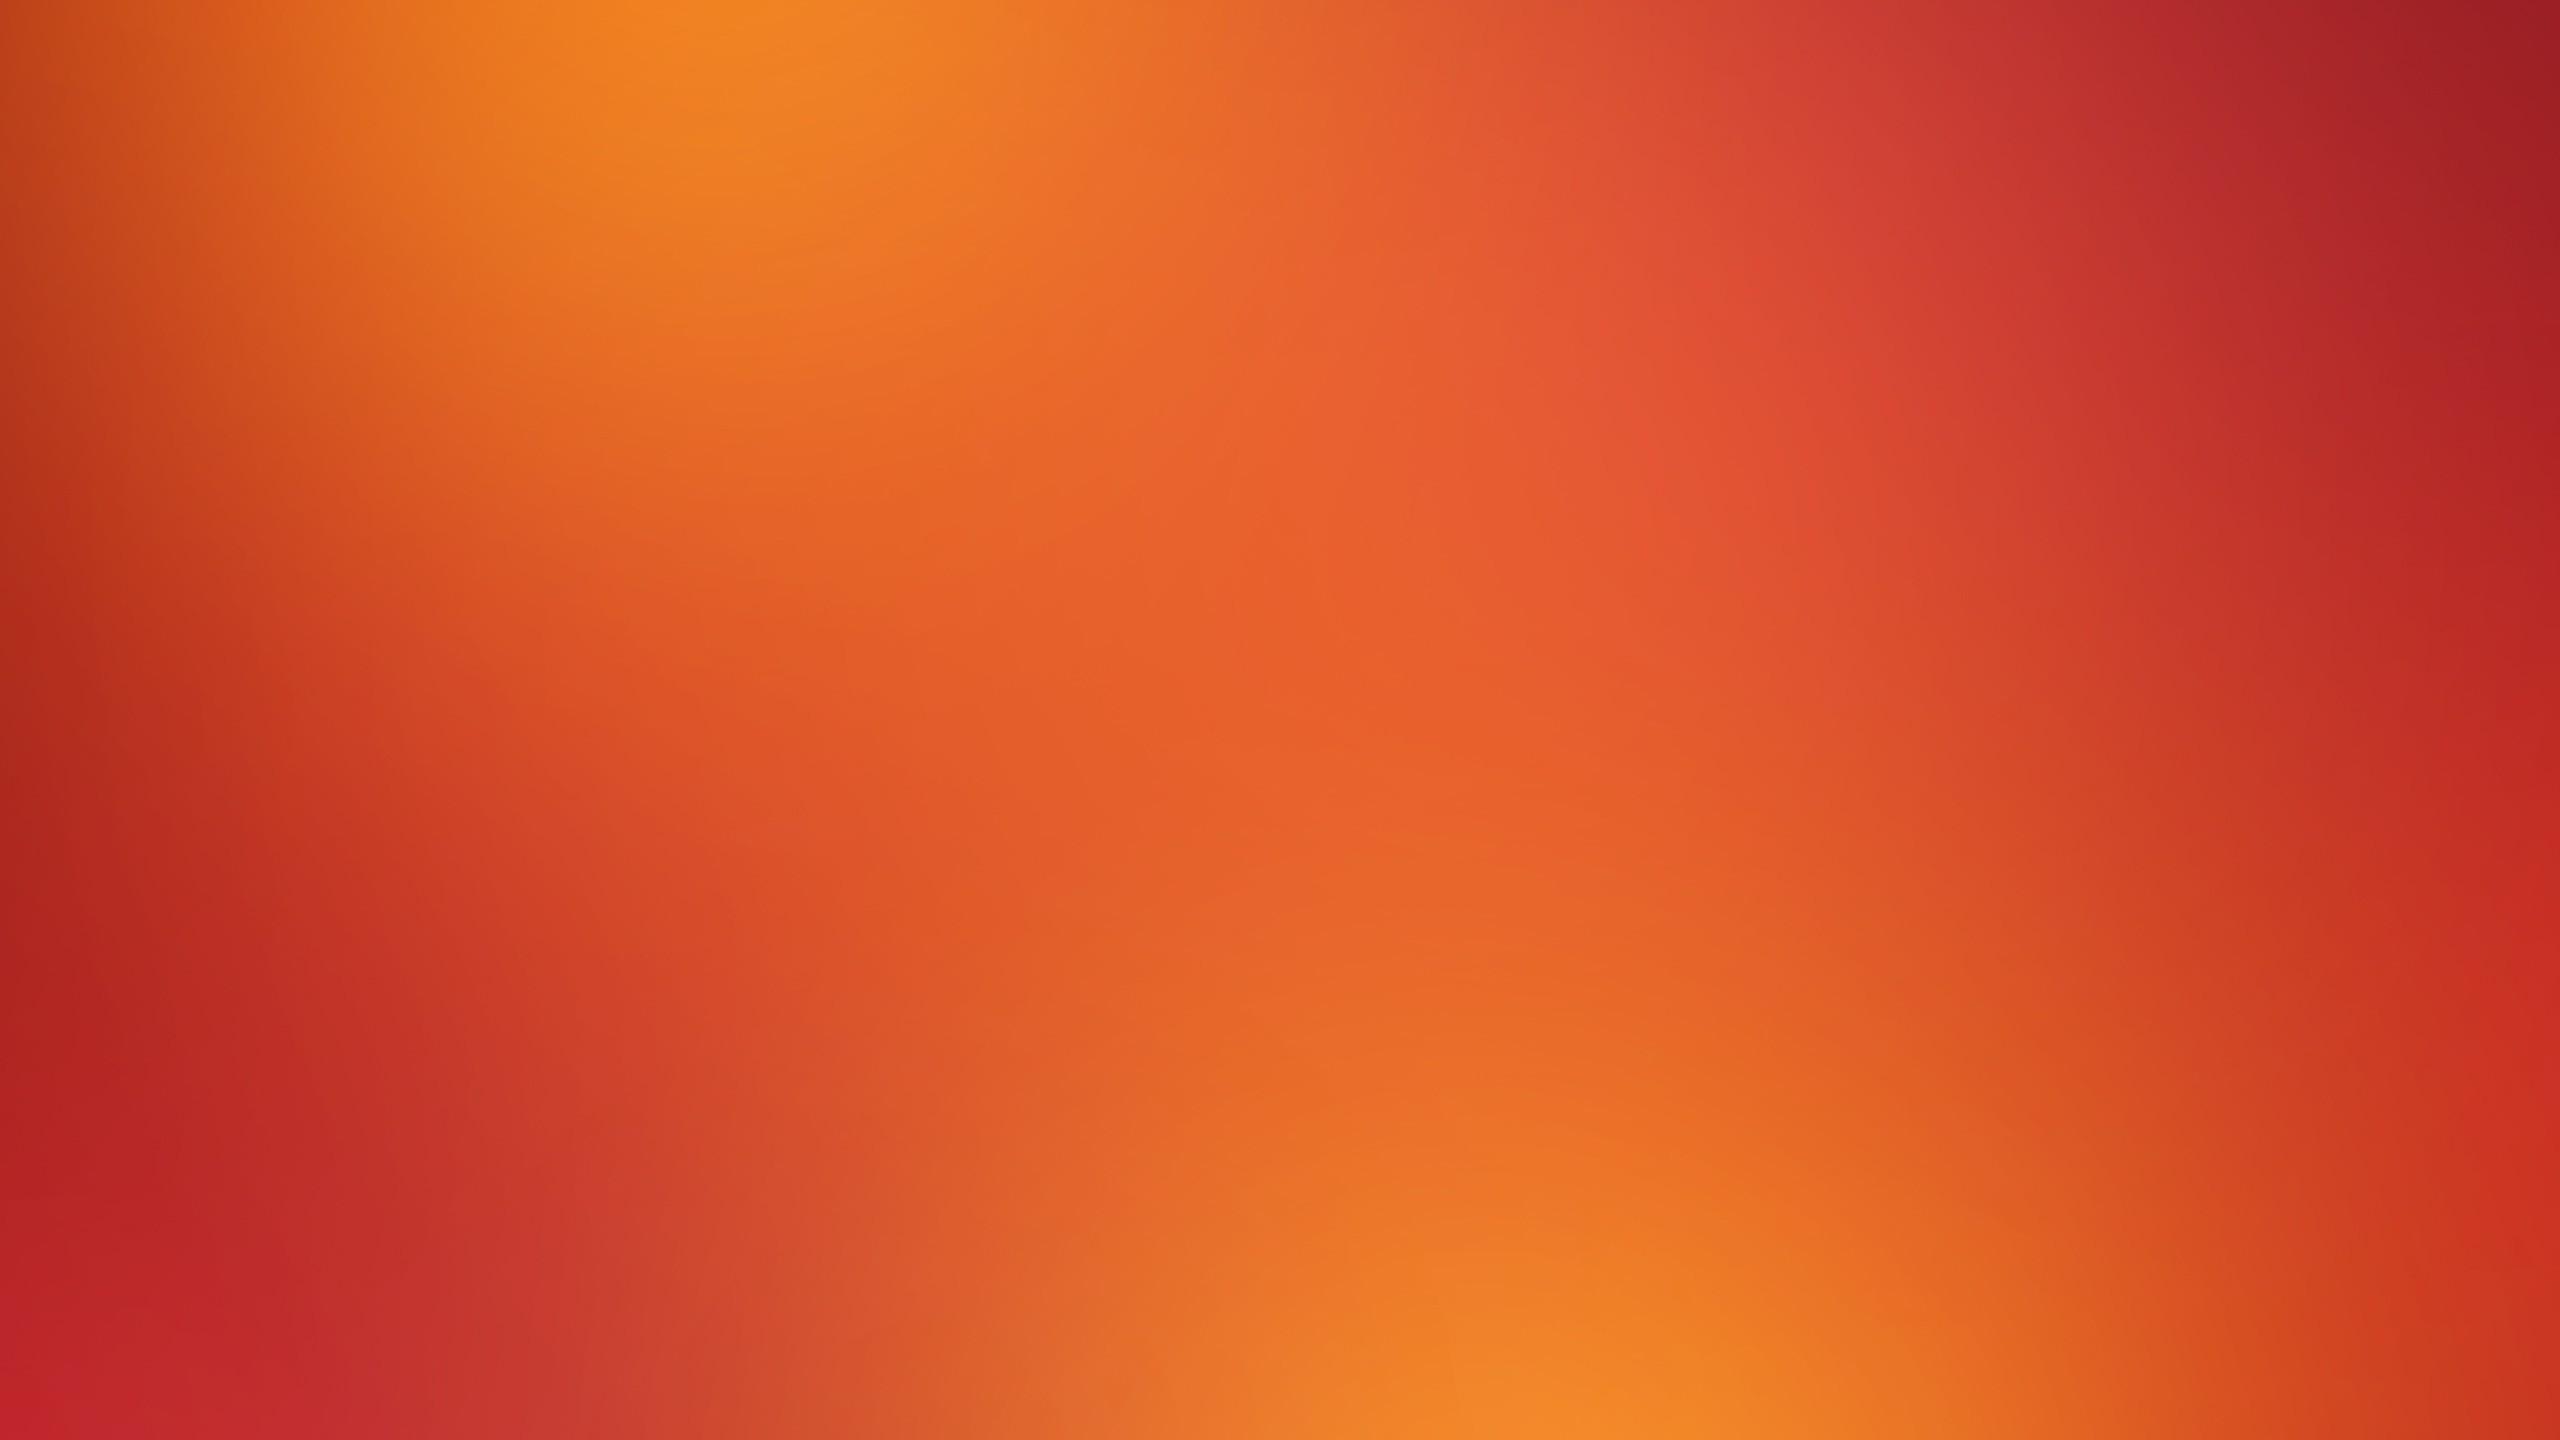 red yellow orange gaussian blur / Wallpaper